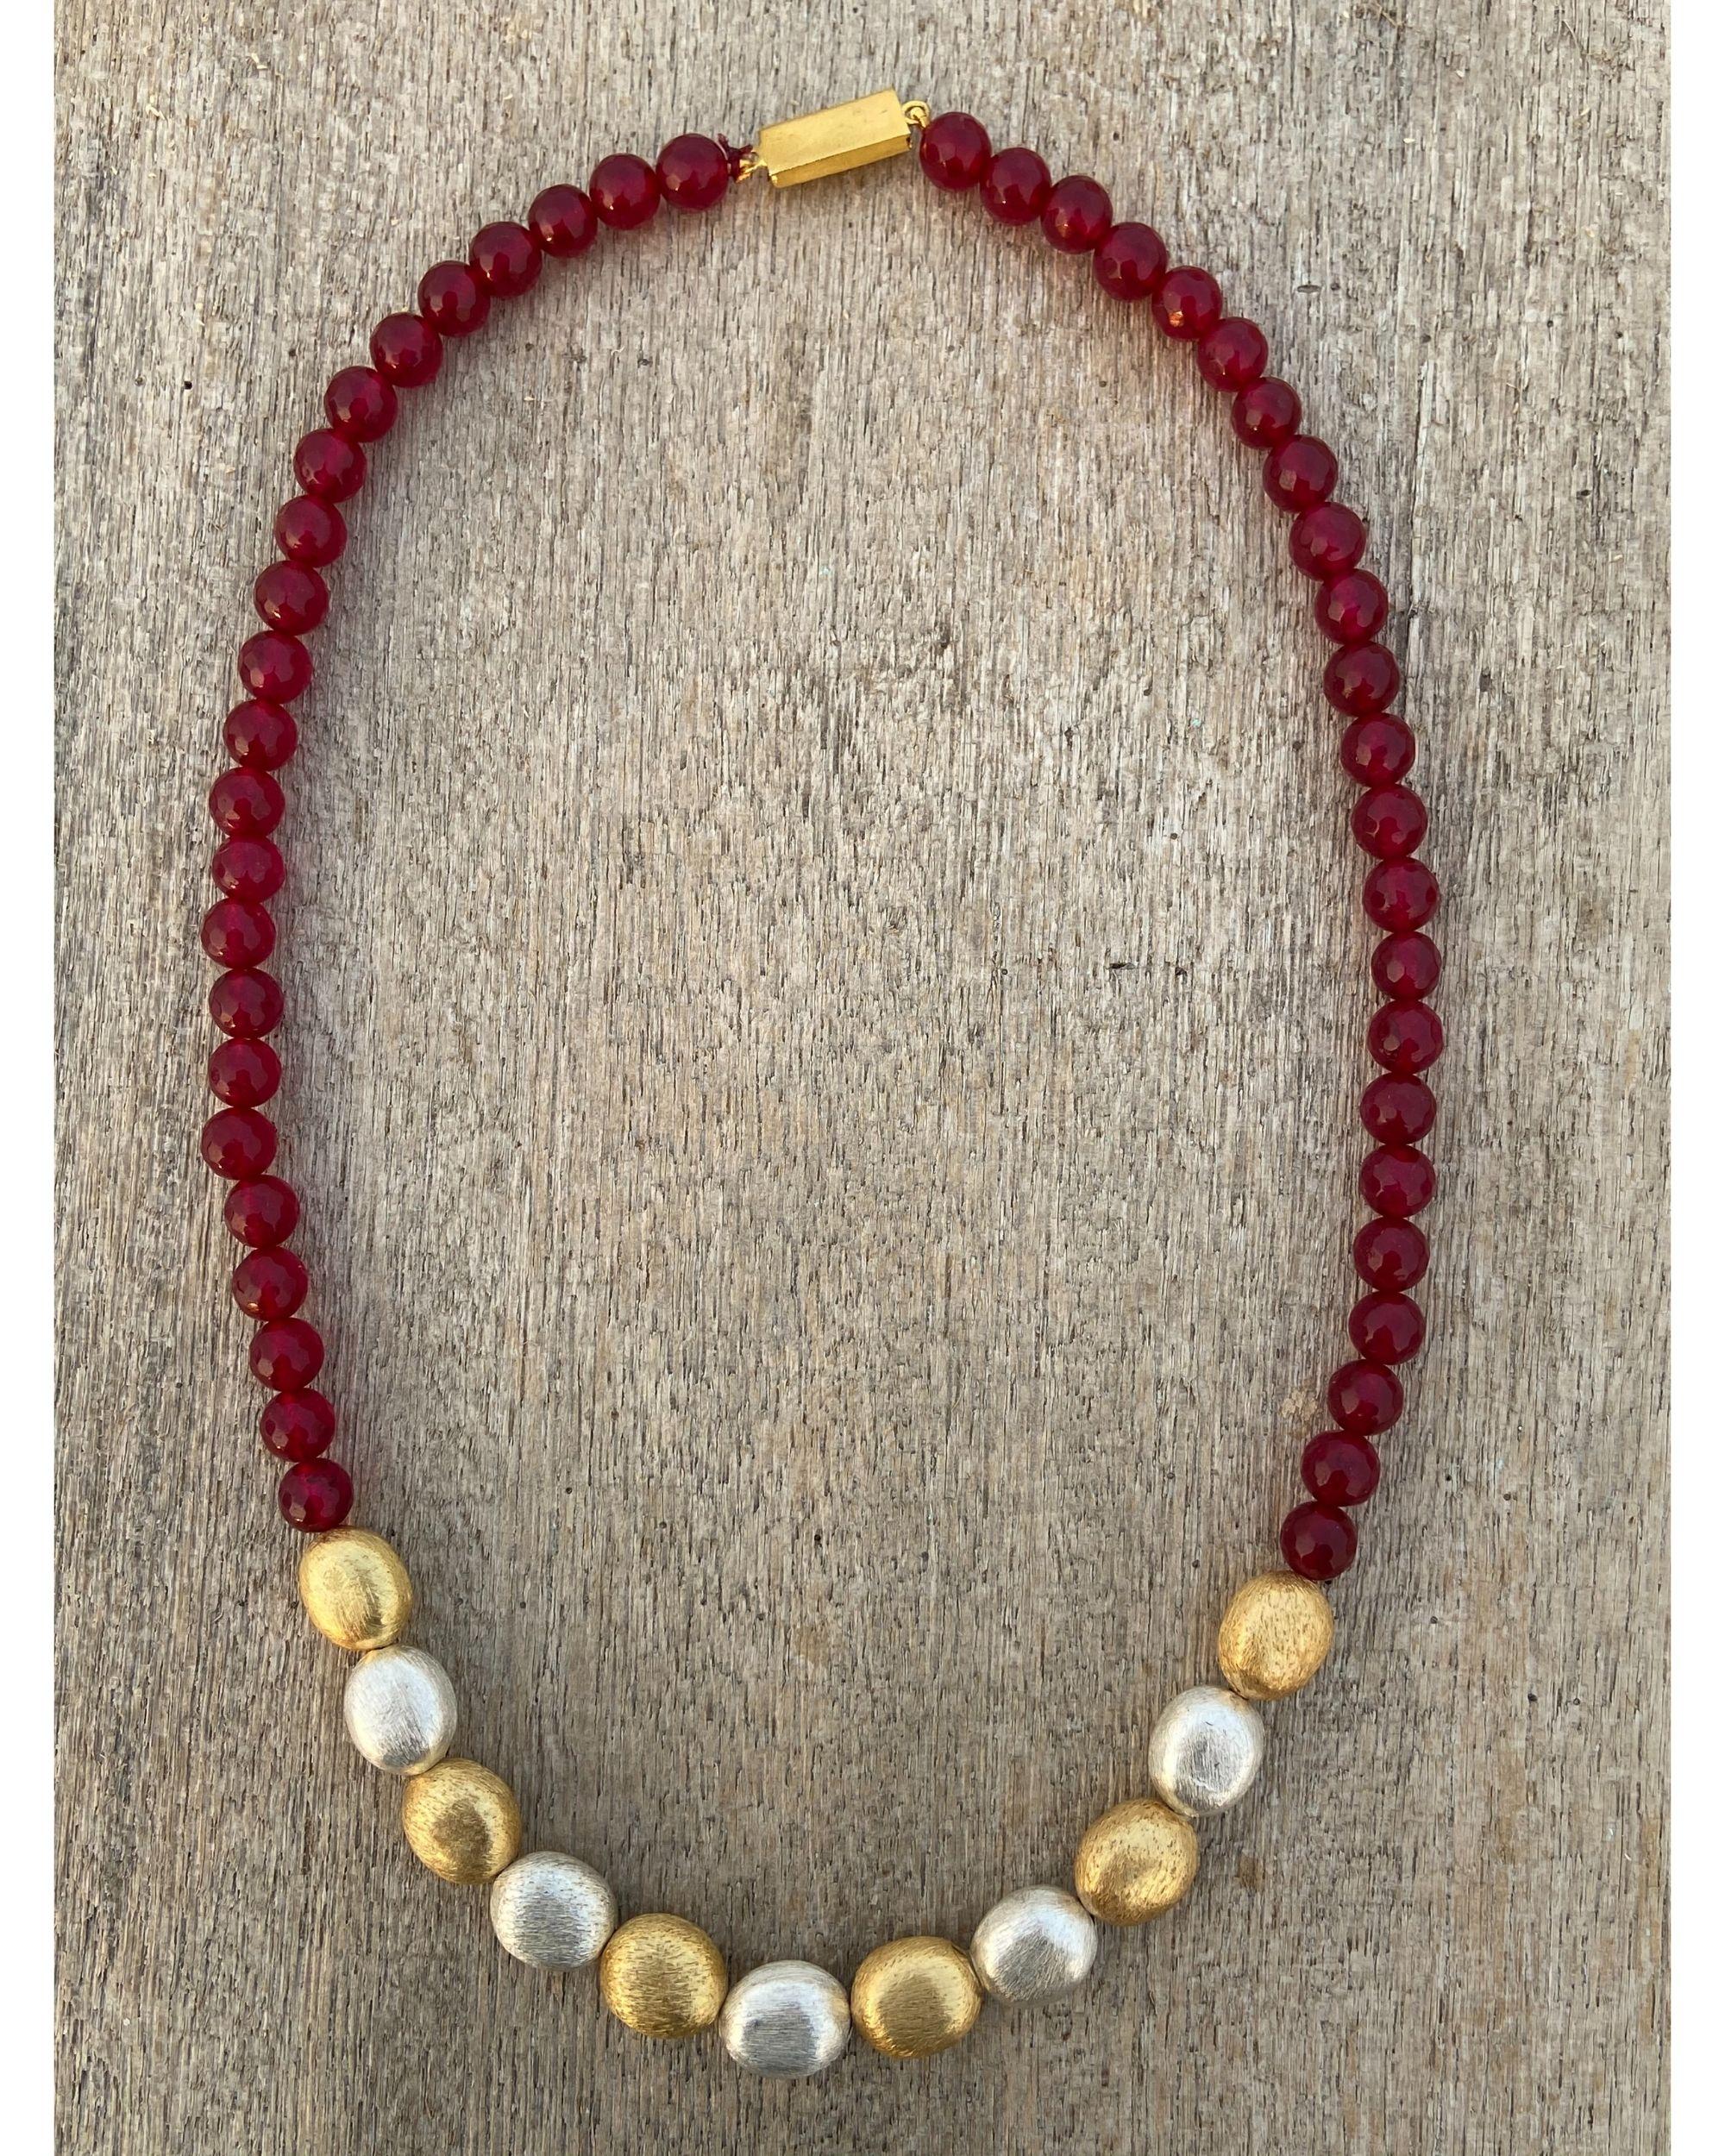 Ruby red beaded neckpiece